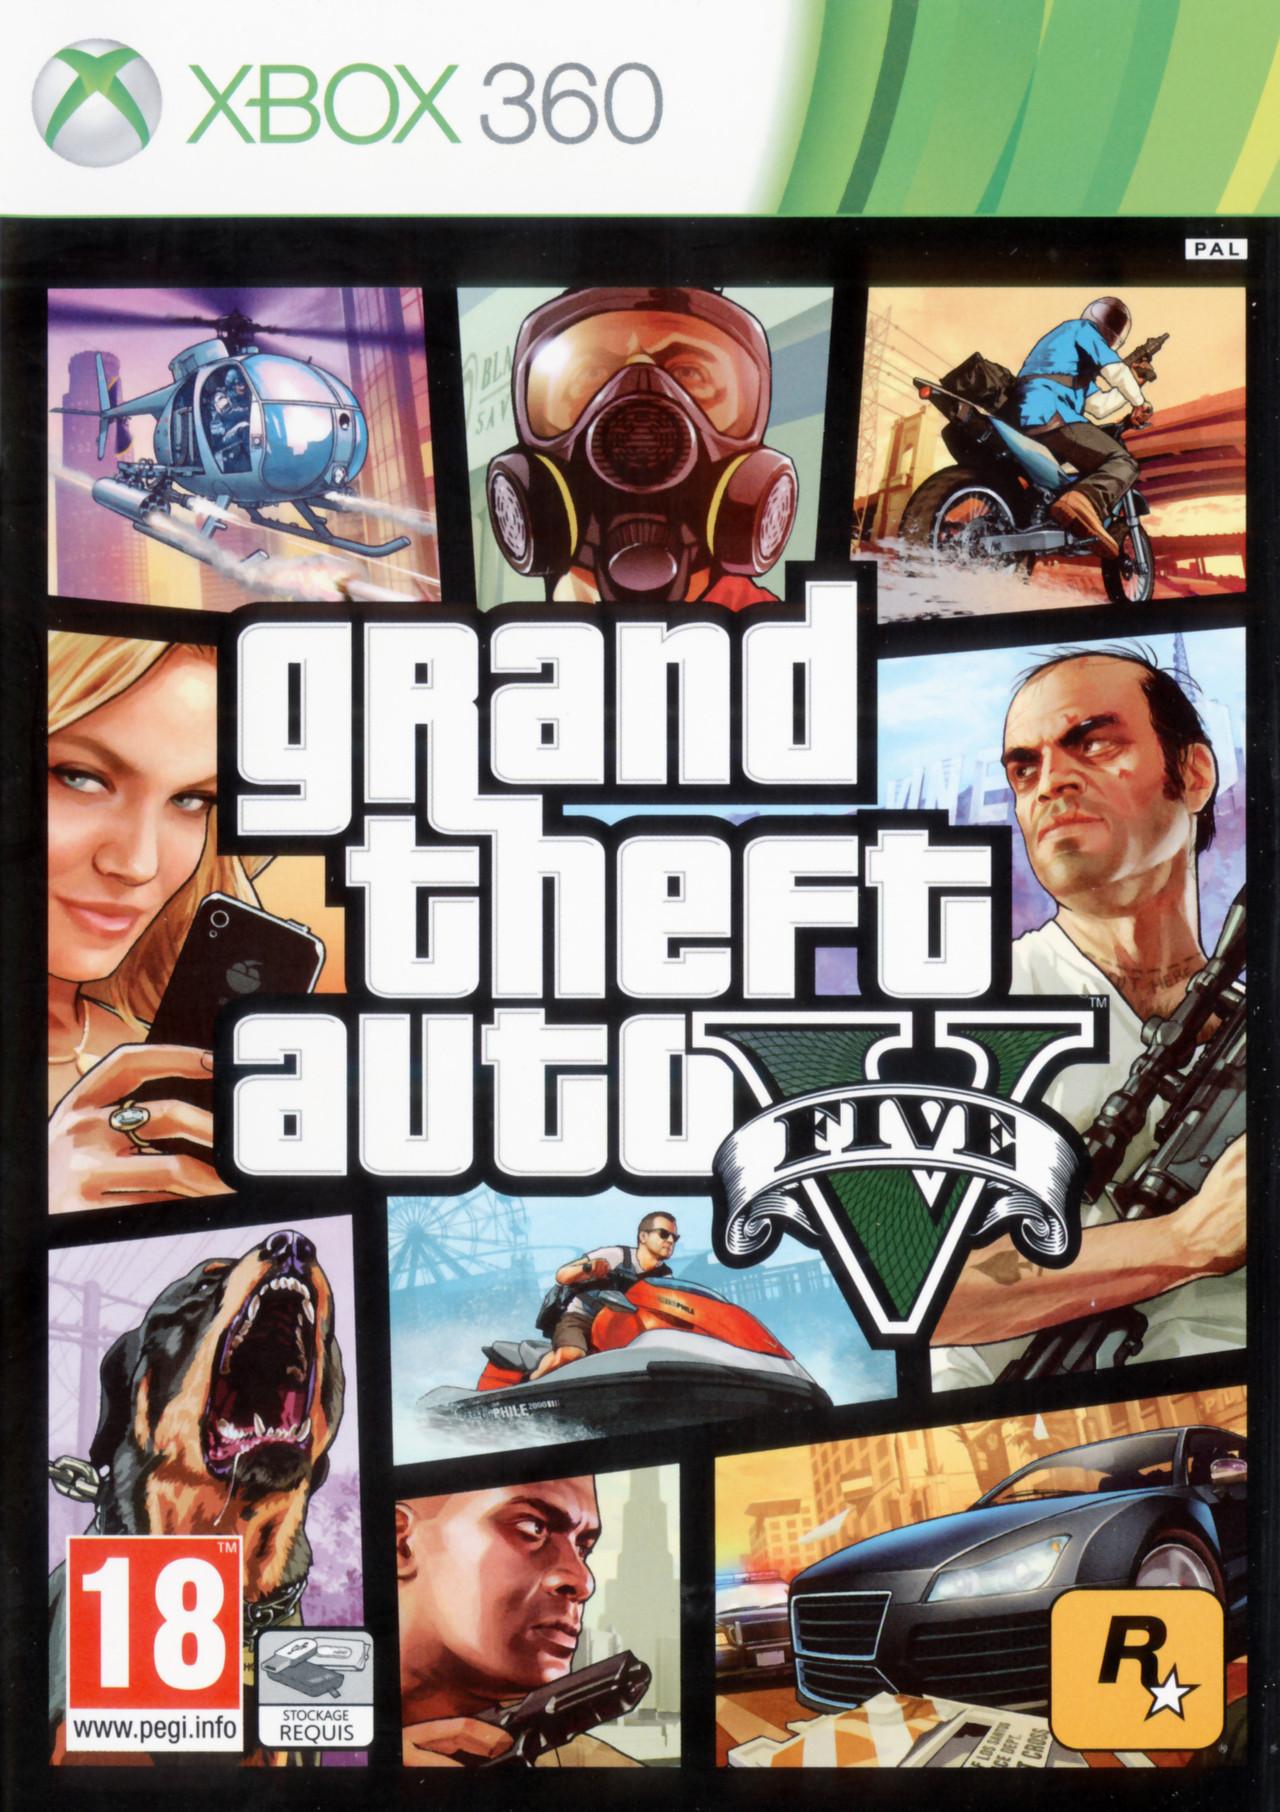 GTA (Grand Theft Auto) 5 sur Xbox 360 - jeuxvideo.com